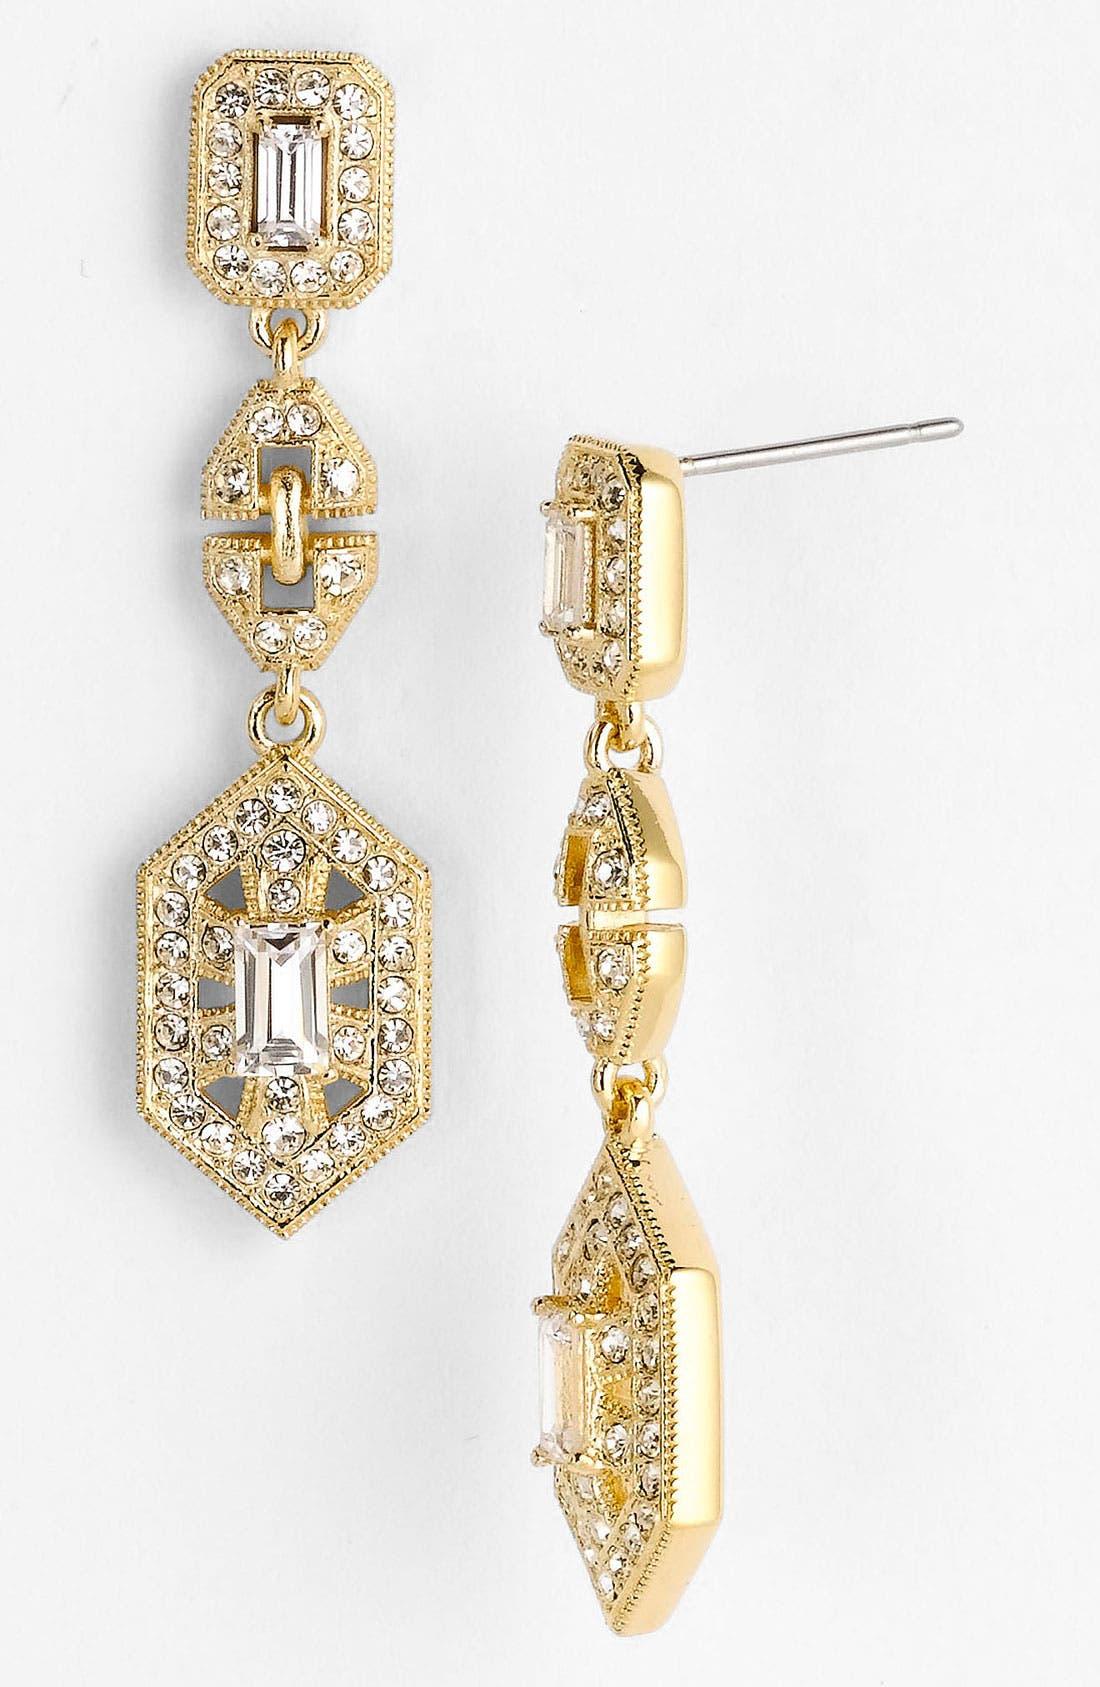 Main Image - Nadri 'Art Deco' Linear Earrings (Nordstrom Exclusive)